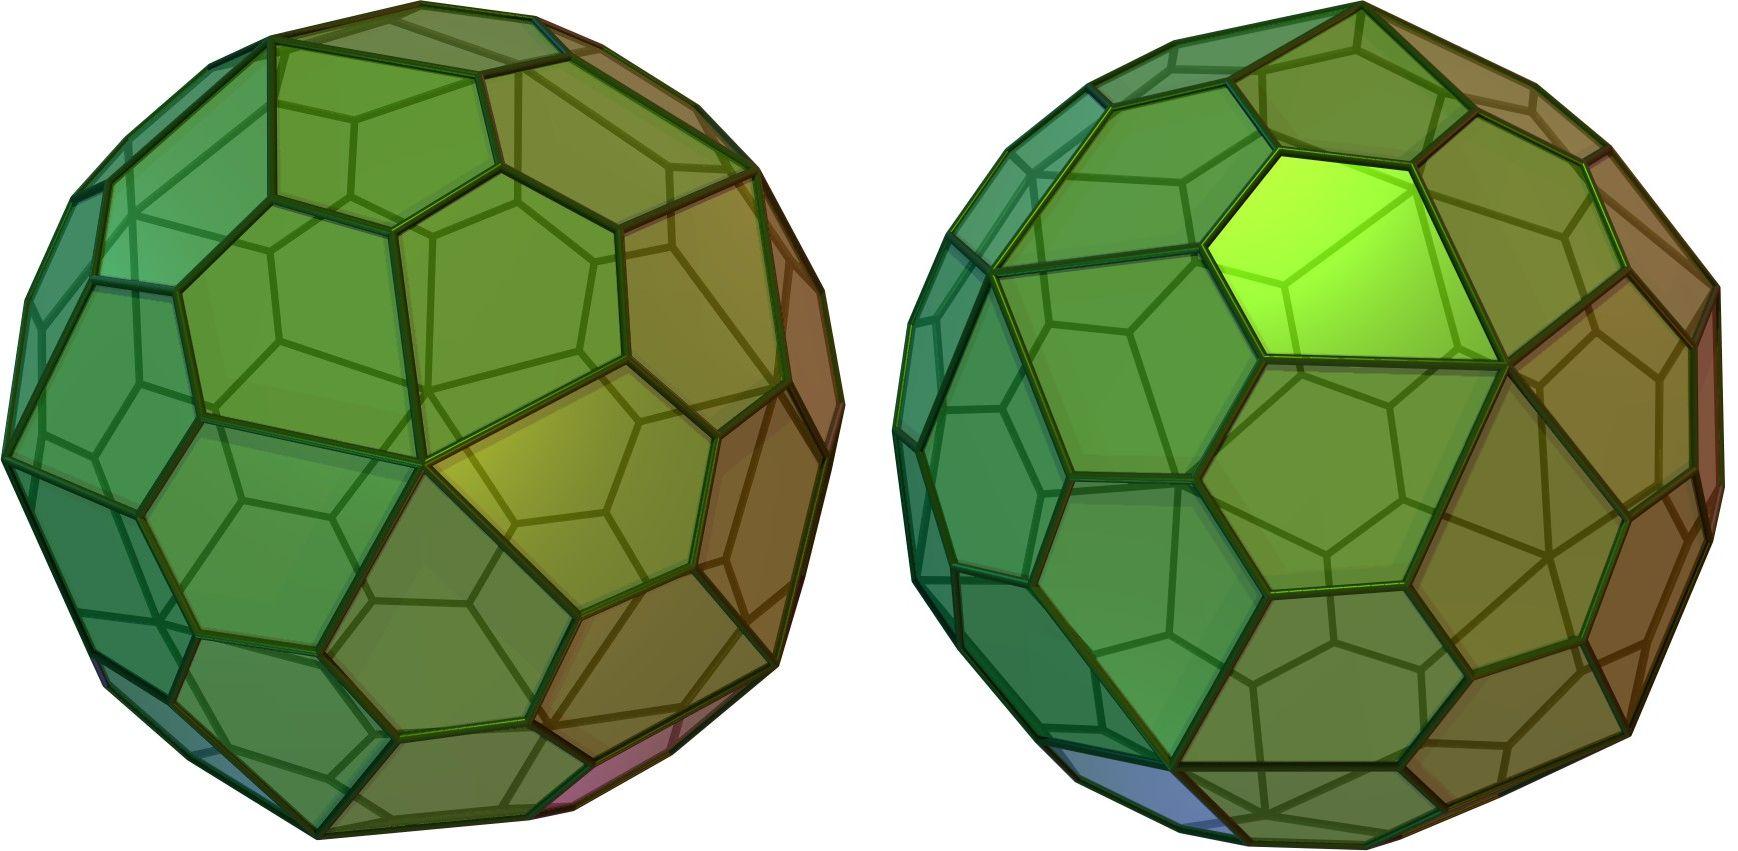 Pentagonal Hexecontahedron